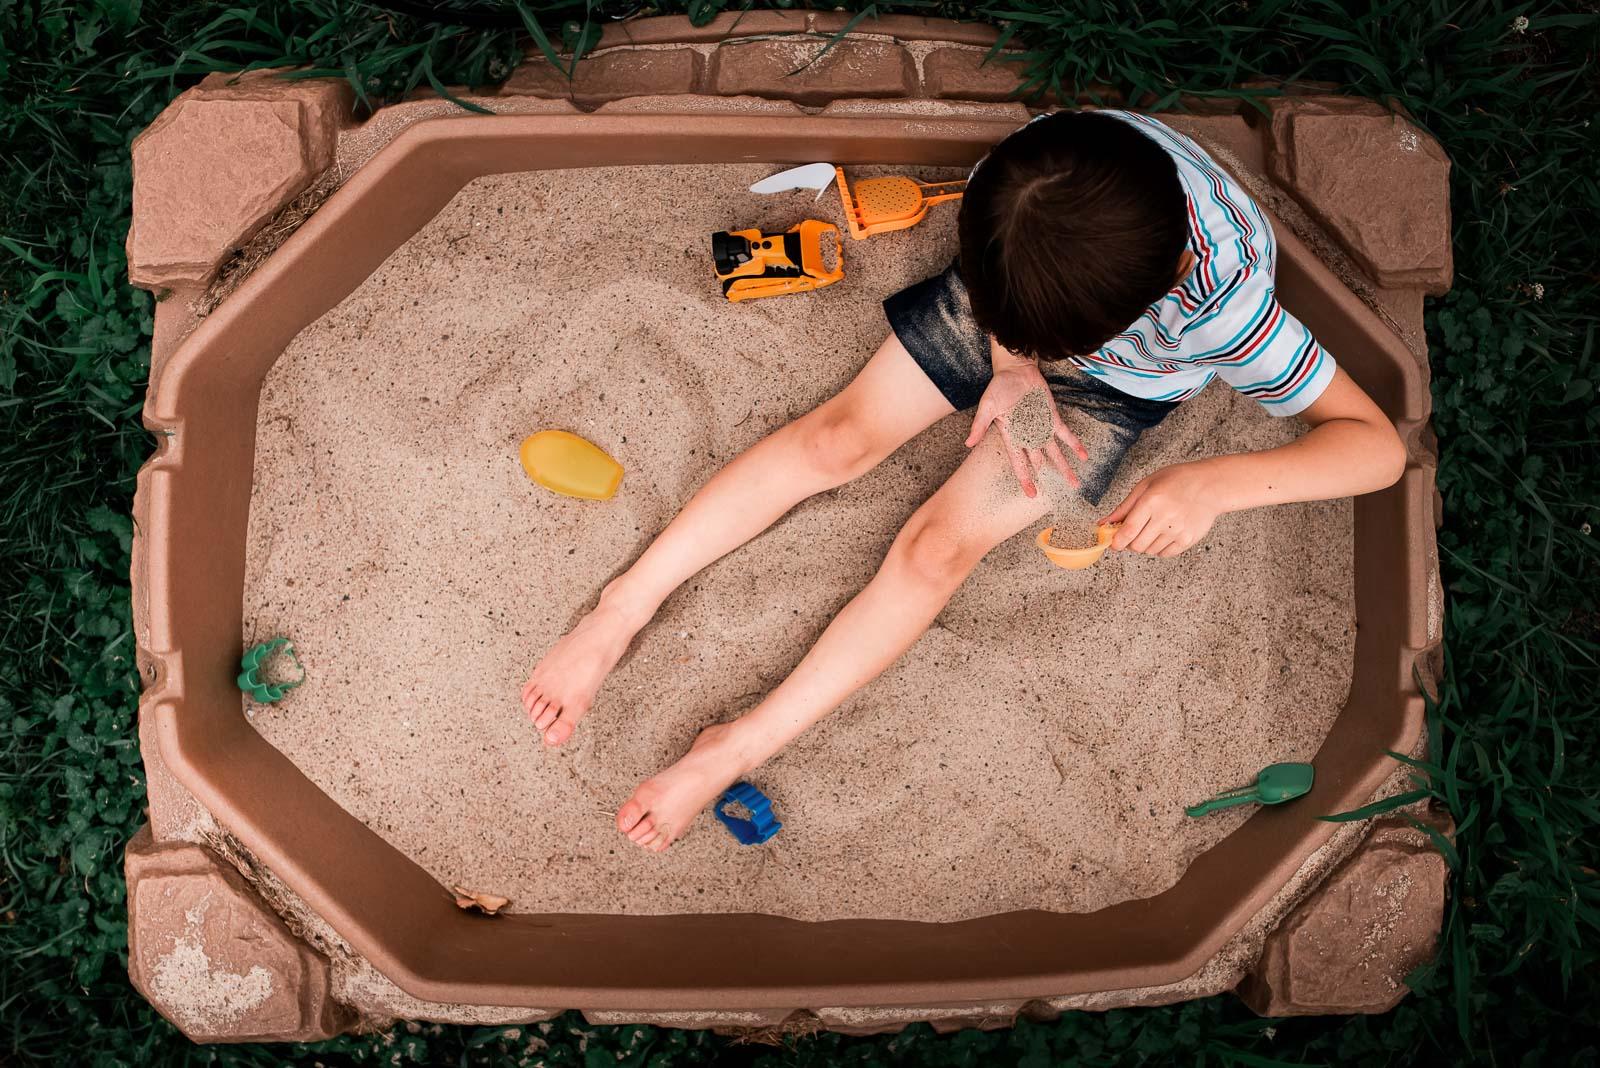 Photographing struggle - autistic child photo in sandbox